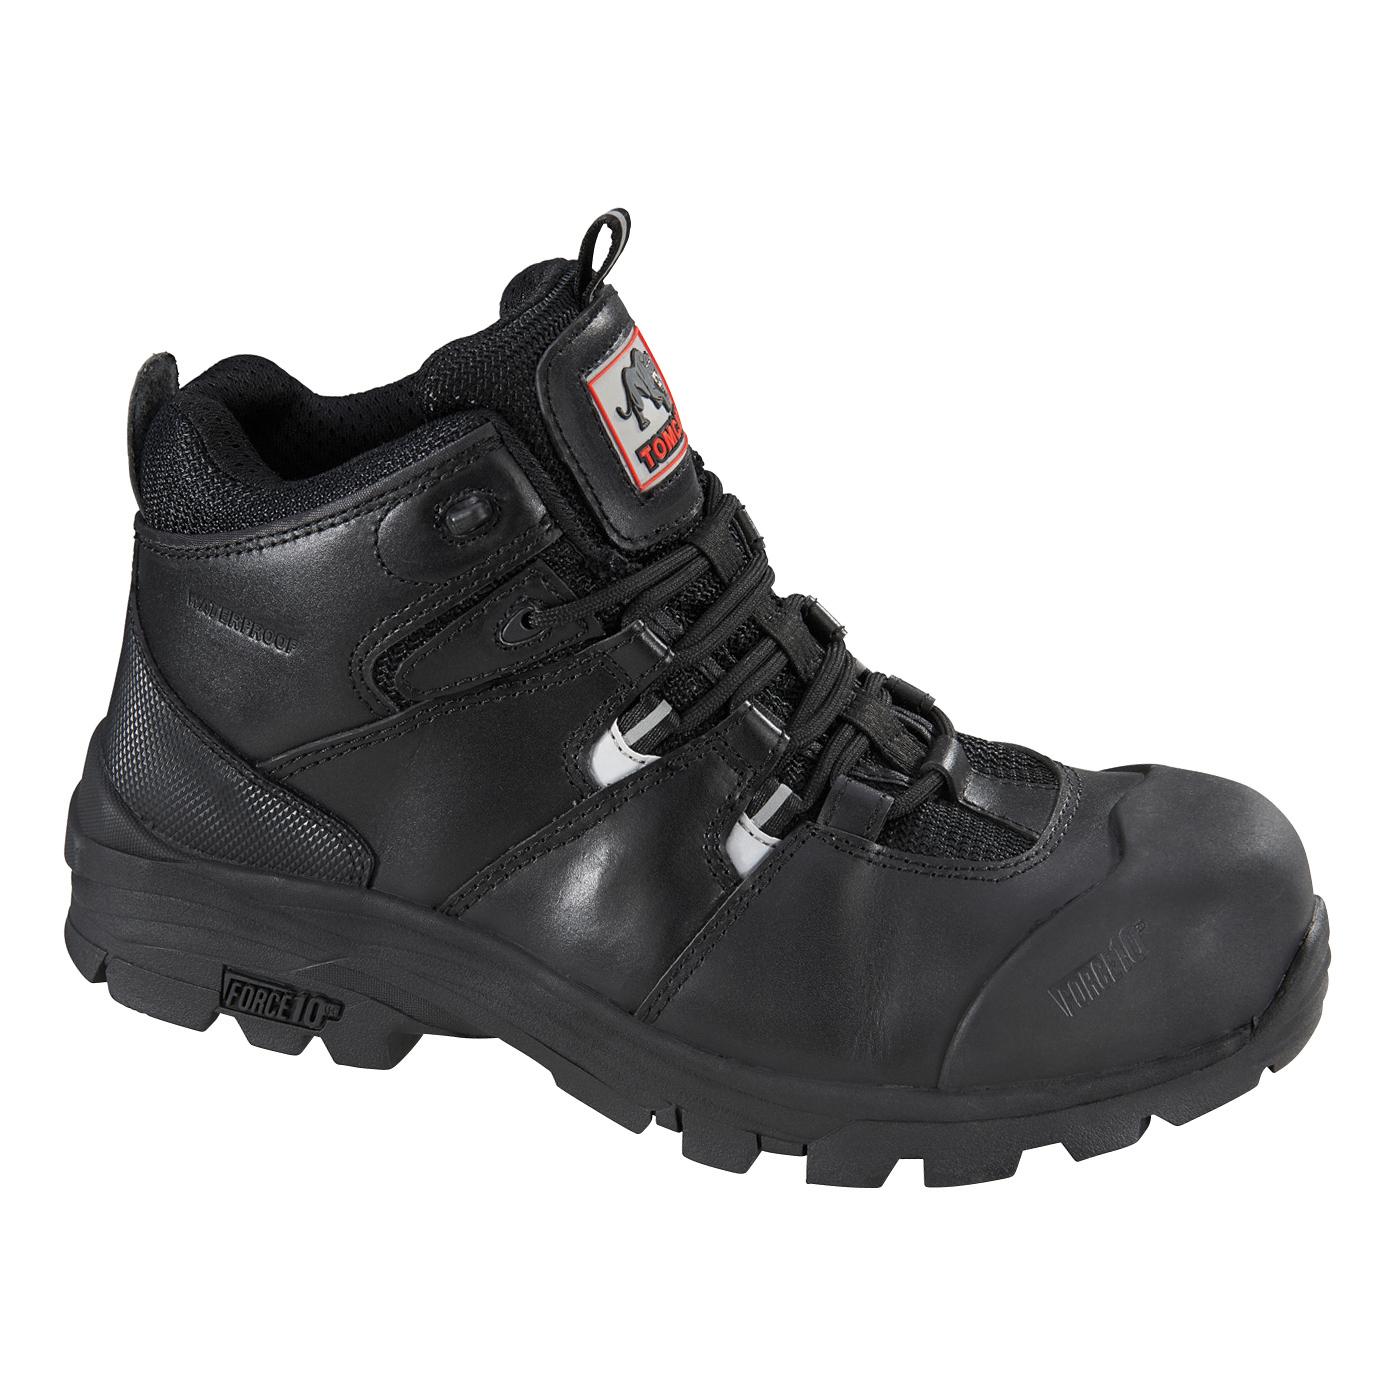 Footwear Rockfall Peakmoor Hiker 100% Non-Metallic Fibreglass Toecap Size 6 Blk Ref TC4200-6 *5-7 Day Leadtime*